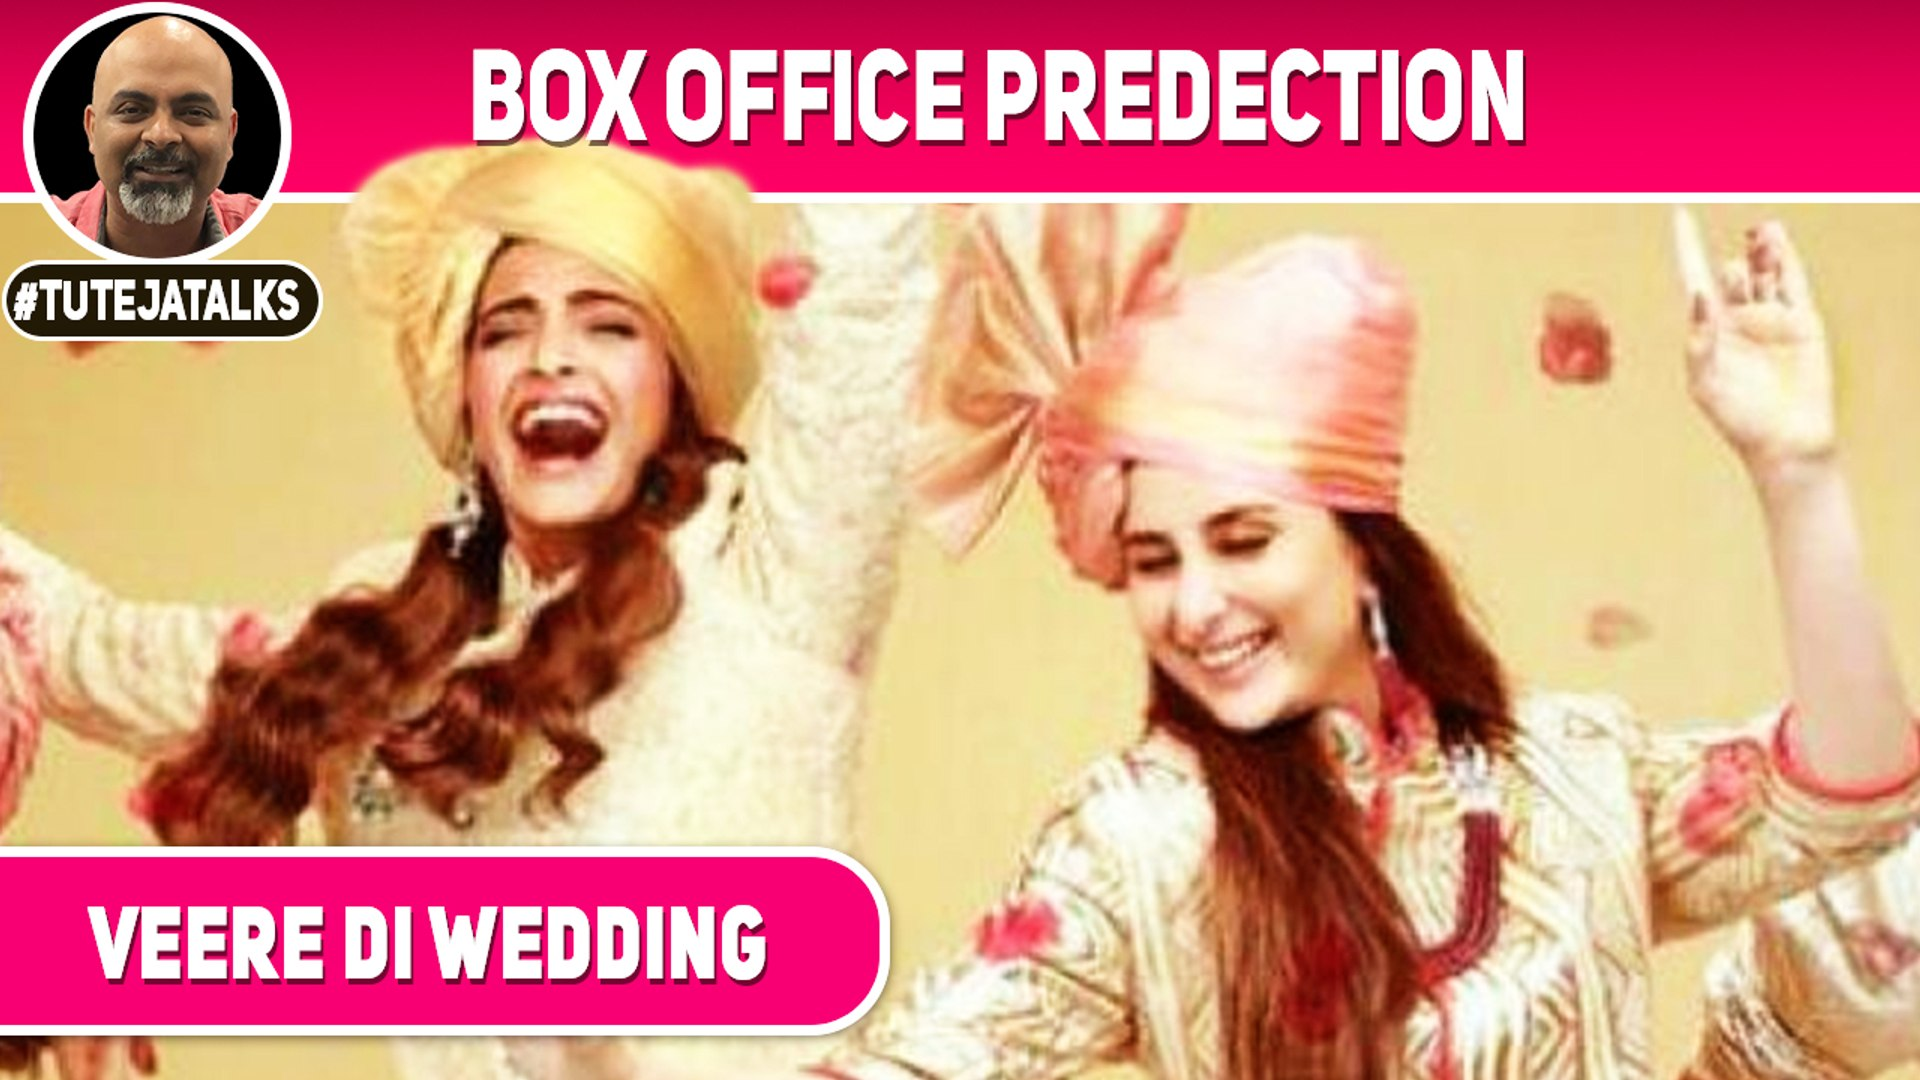 Veere Di Wedding Box Office.Veere Di Wedding Box Office Prediction Kareena Kapoor Sonam Kapoor